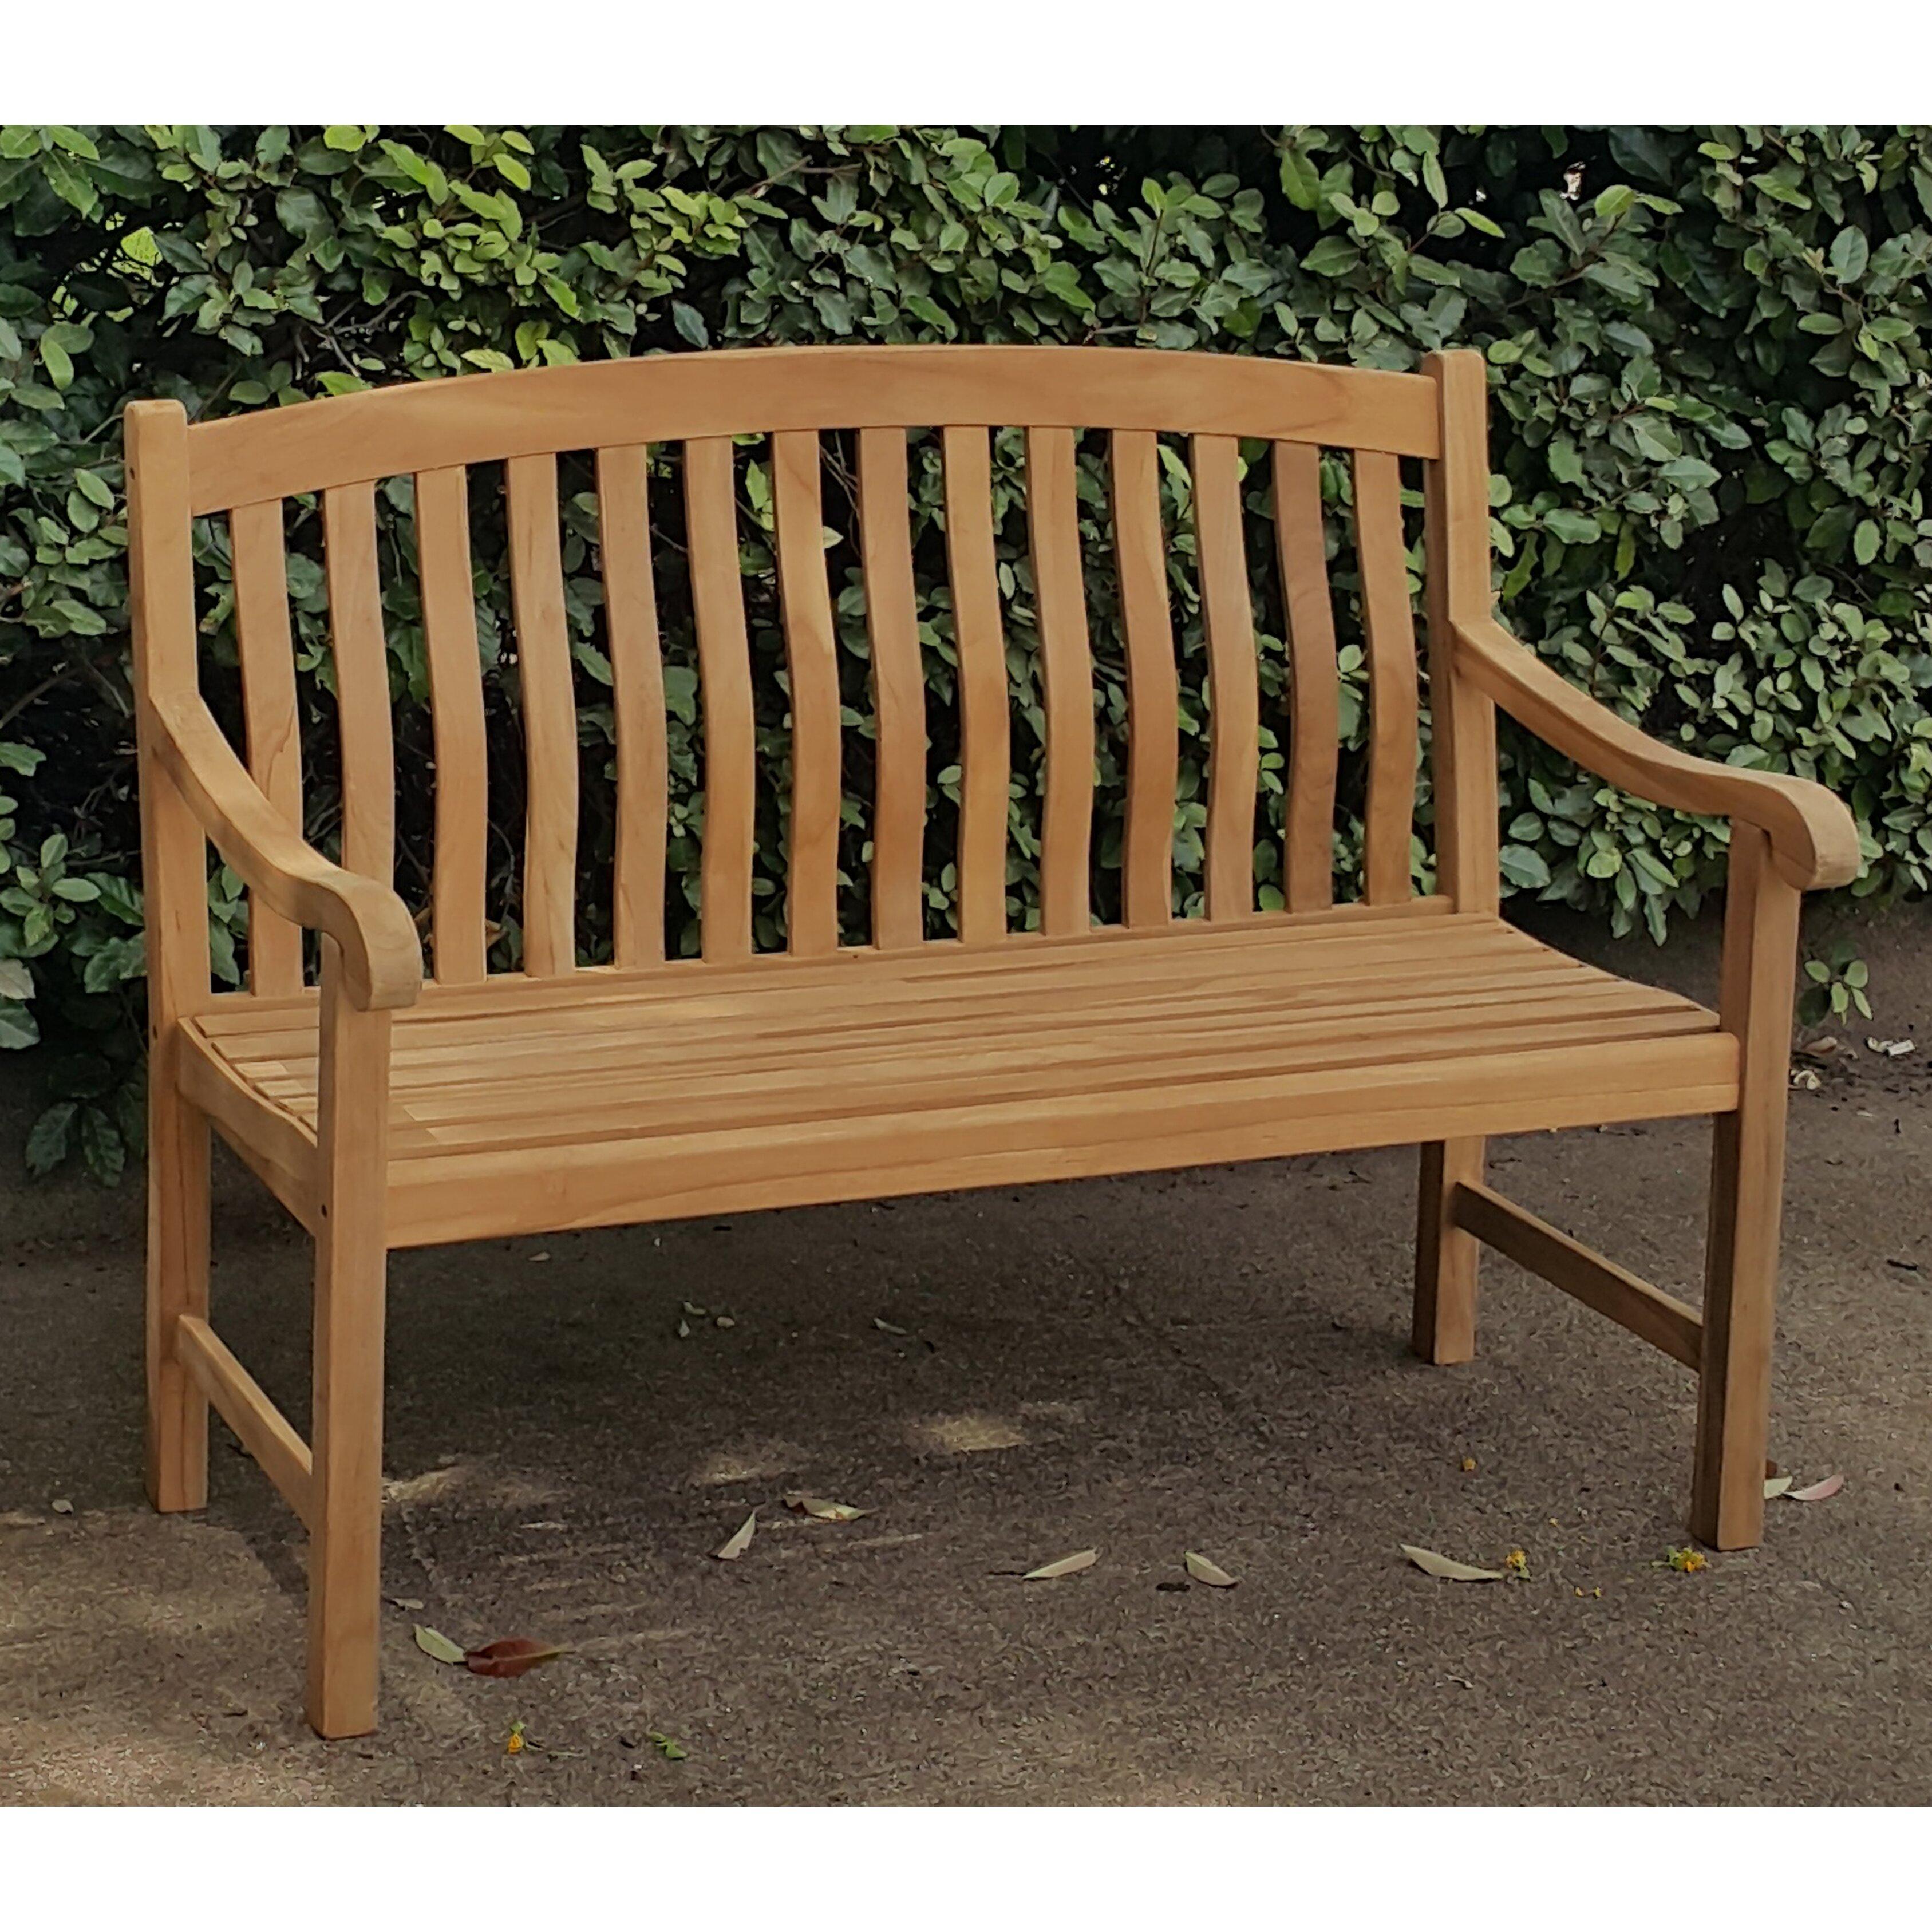 Crestwood Seymour Teak Garden Bench Reviews Wayfair